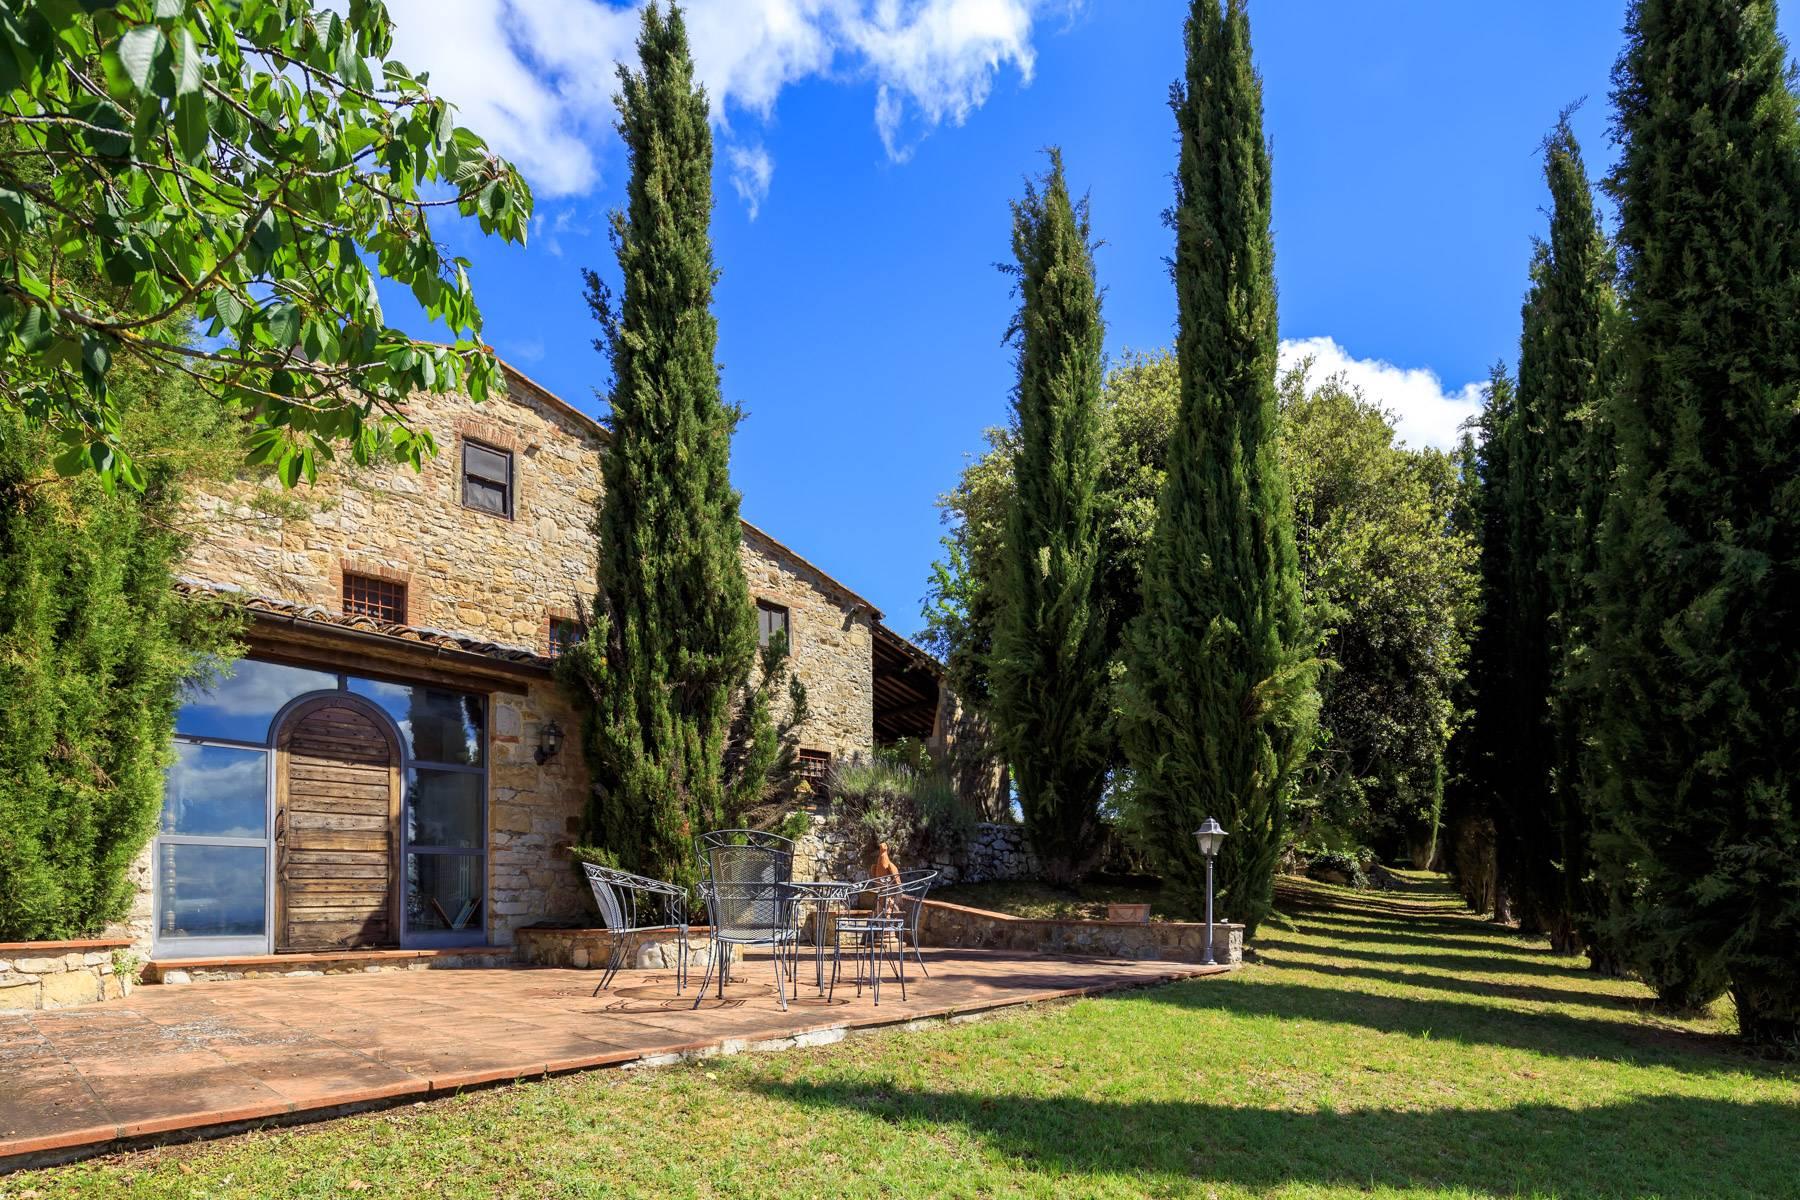 Villa in Vendita a Gaiole In Chianti: 5 locali, 465 mq - Foto 3